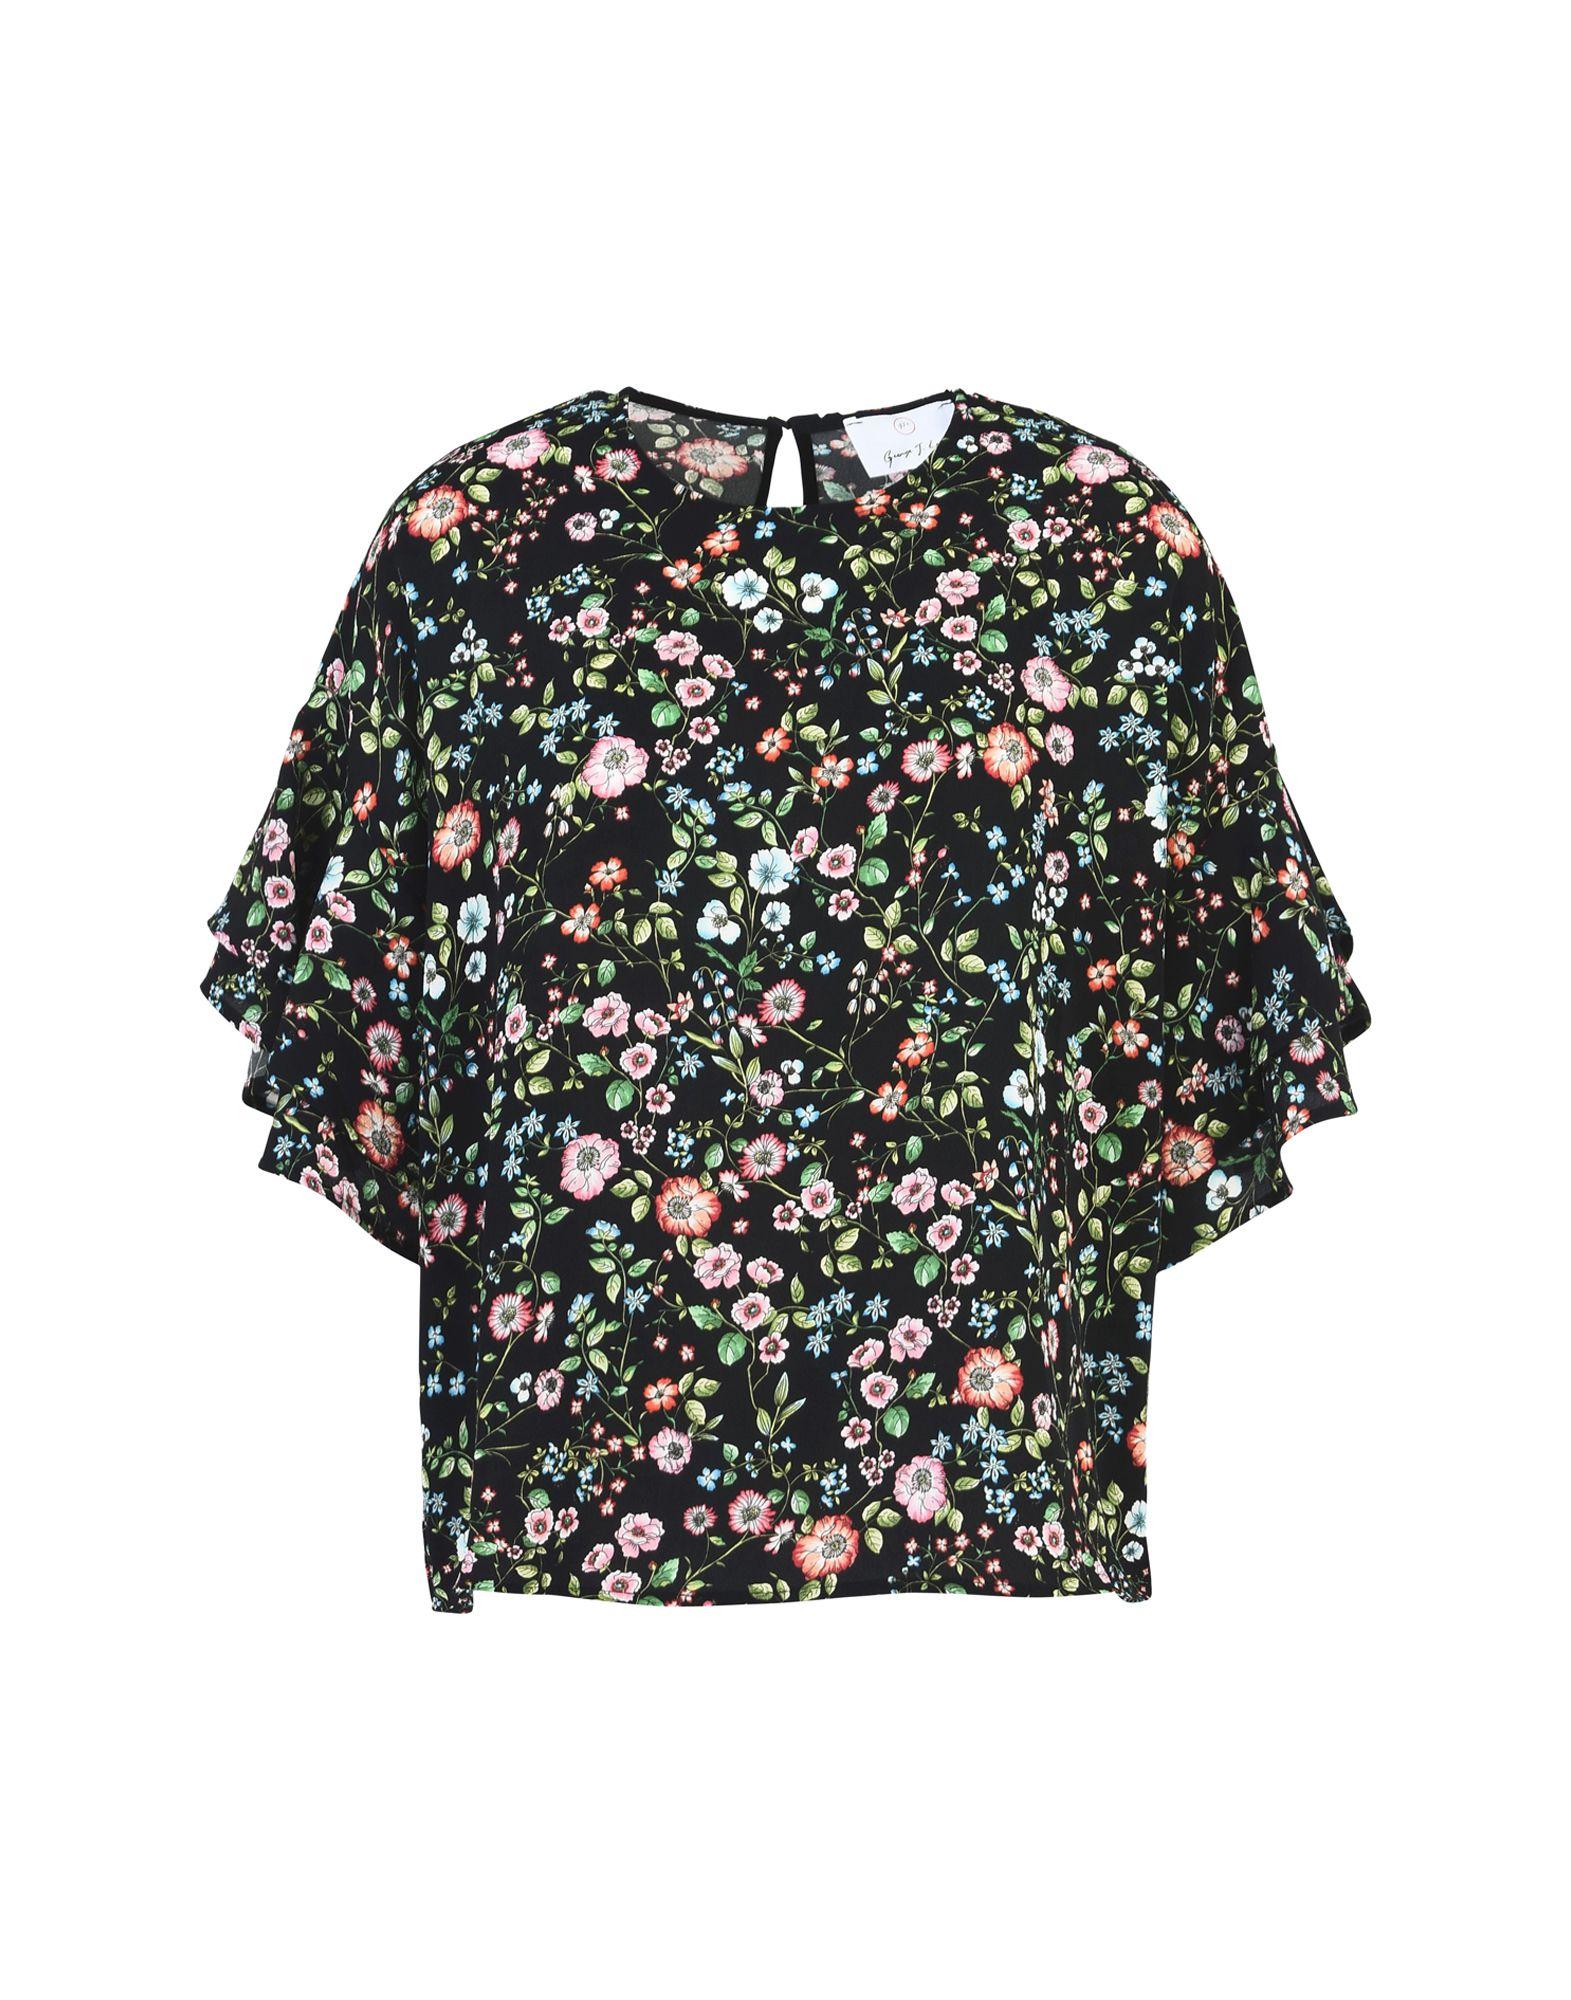 ФОТО george j. love блузка